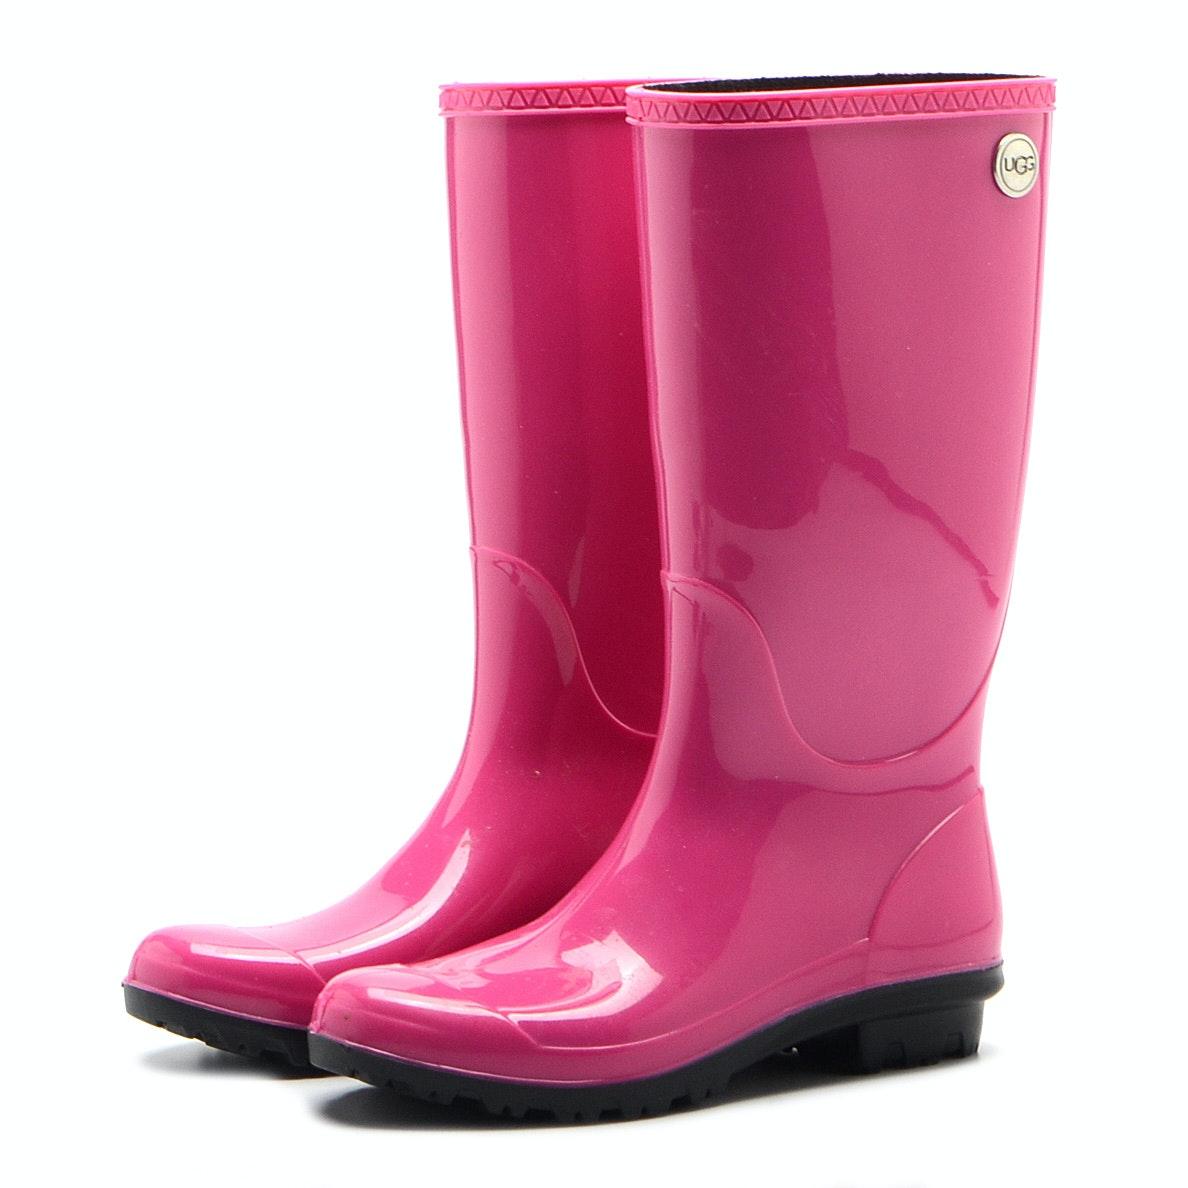 UGG Hot Pink Rain Boots